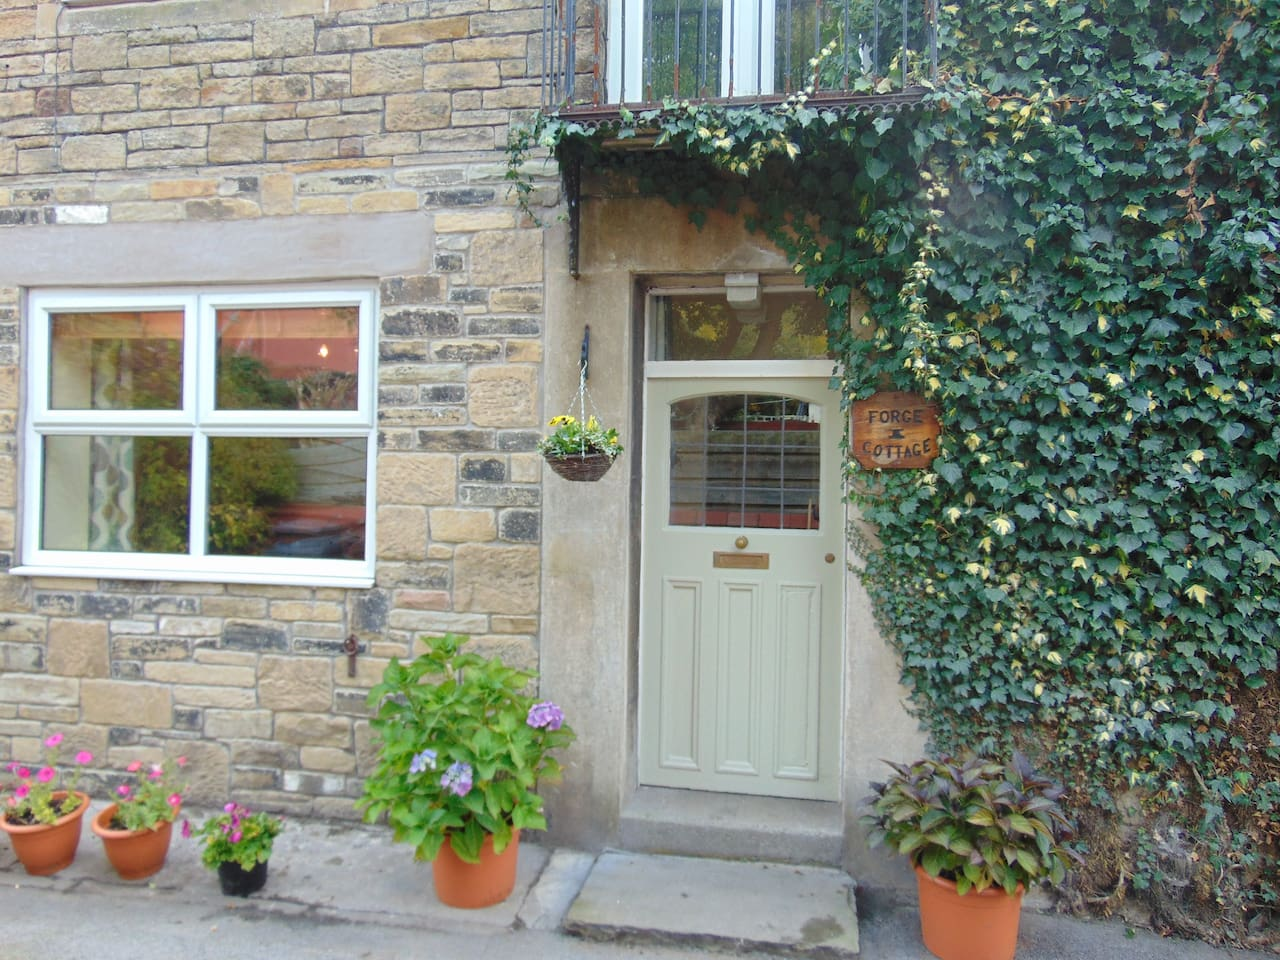 Forge Cottage - Front Door